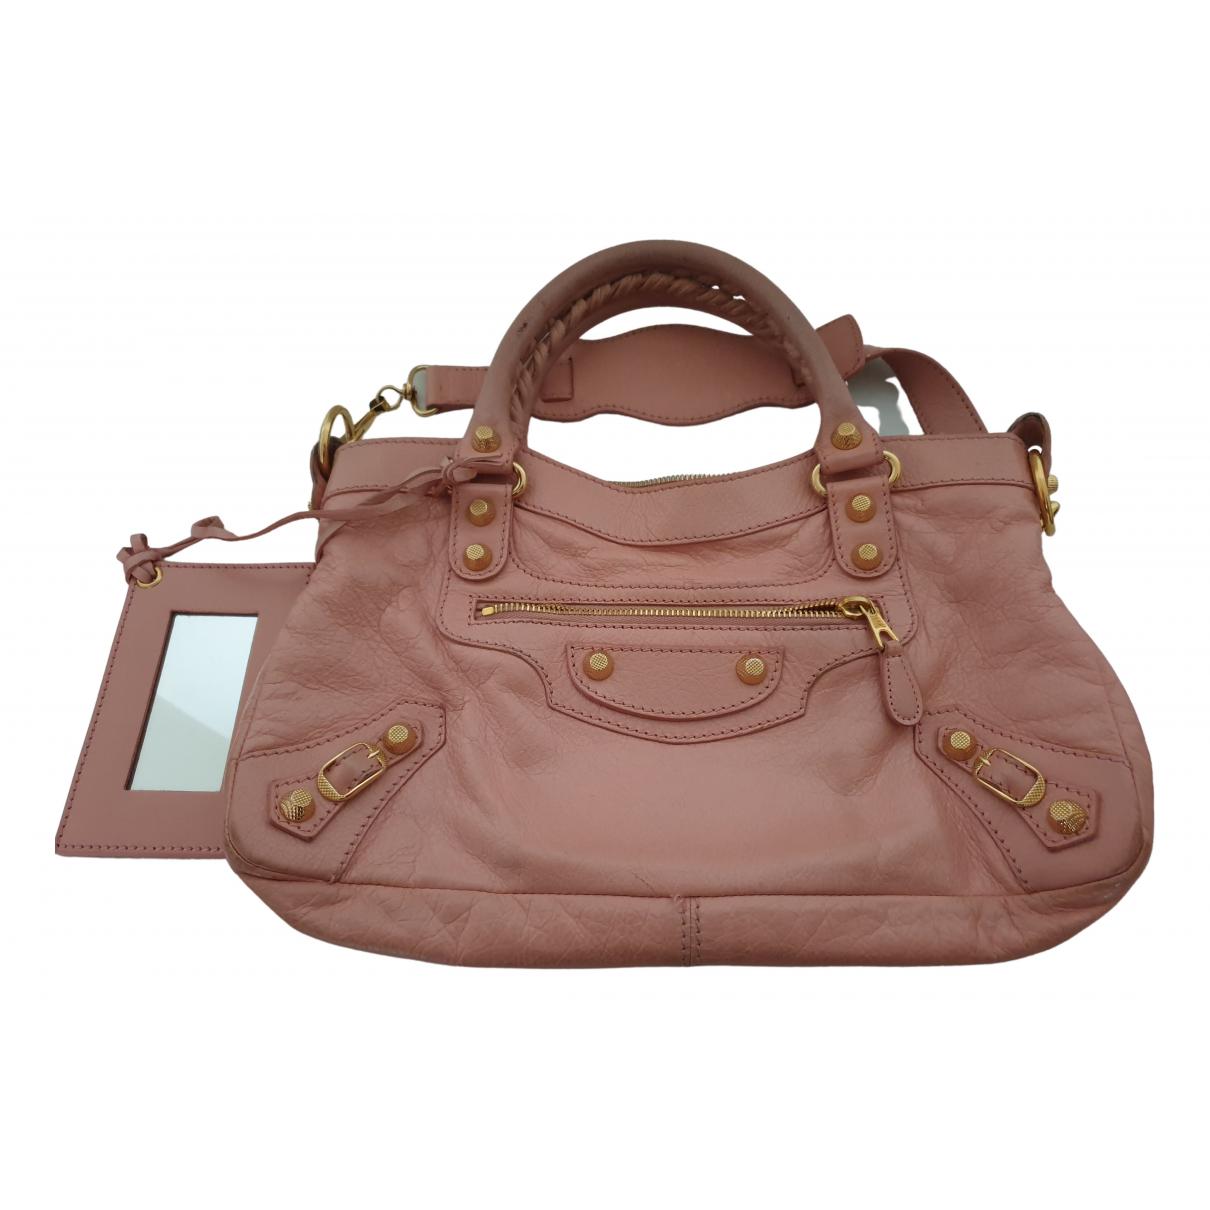 Balenciaga Town Pink Leather handbag for Women \N